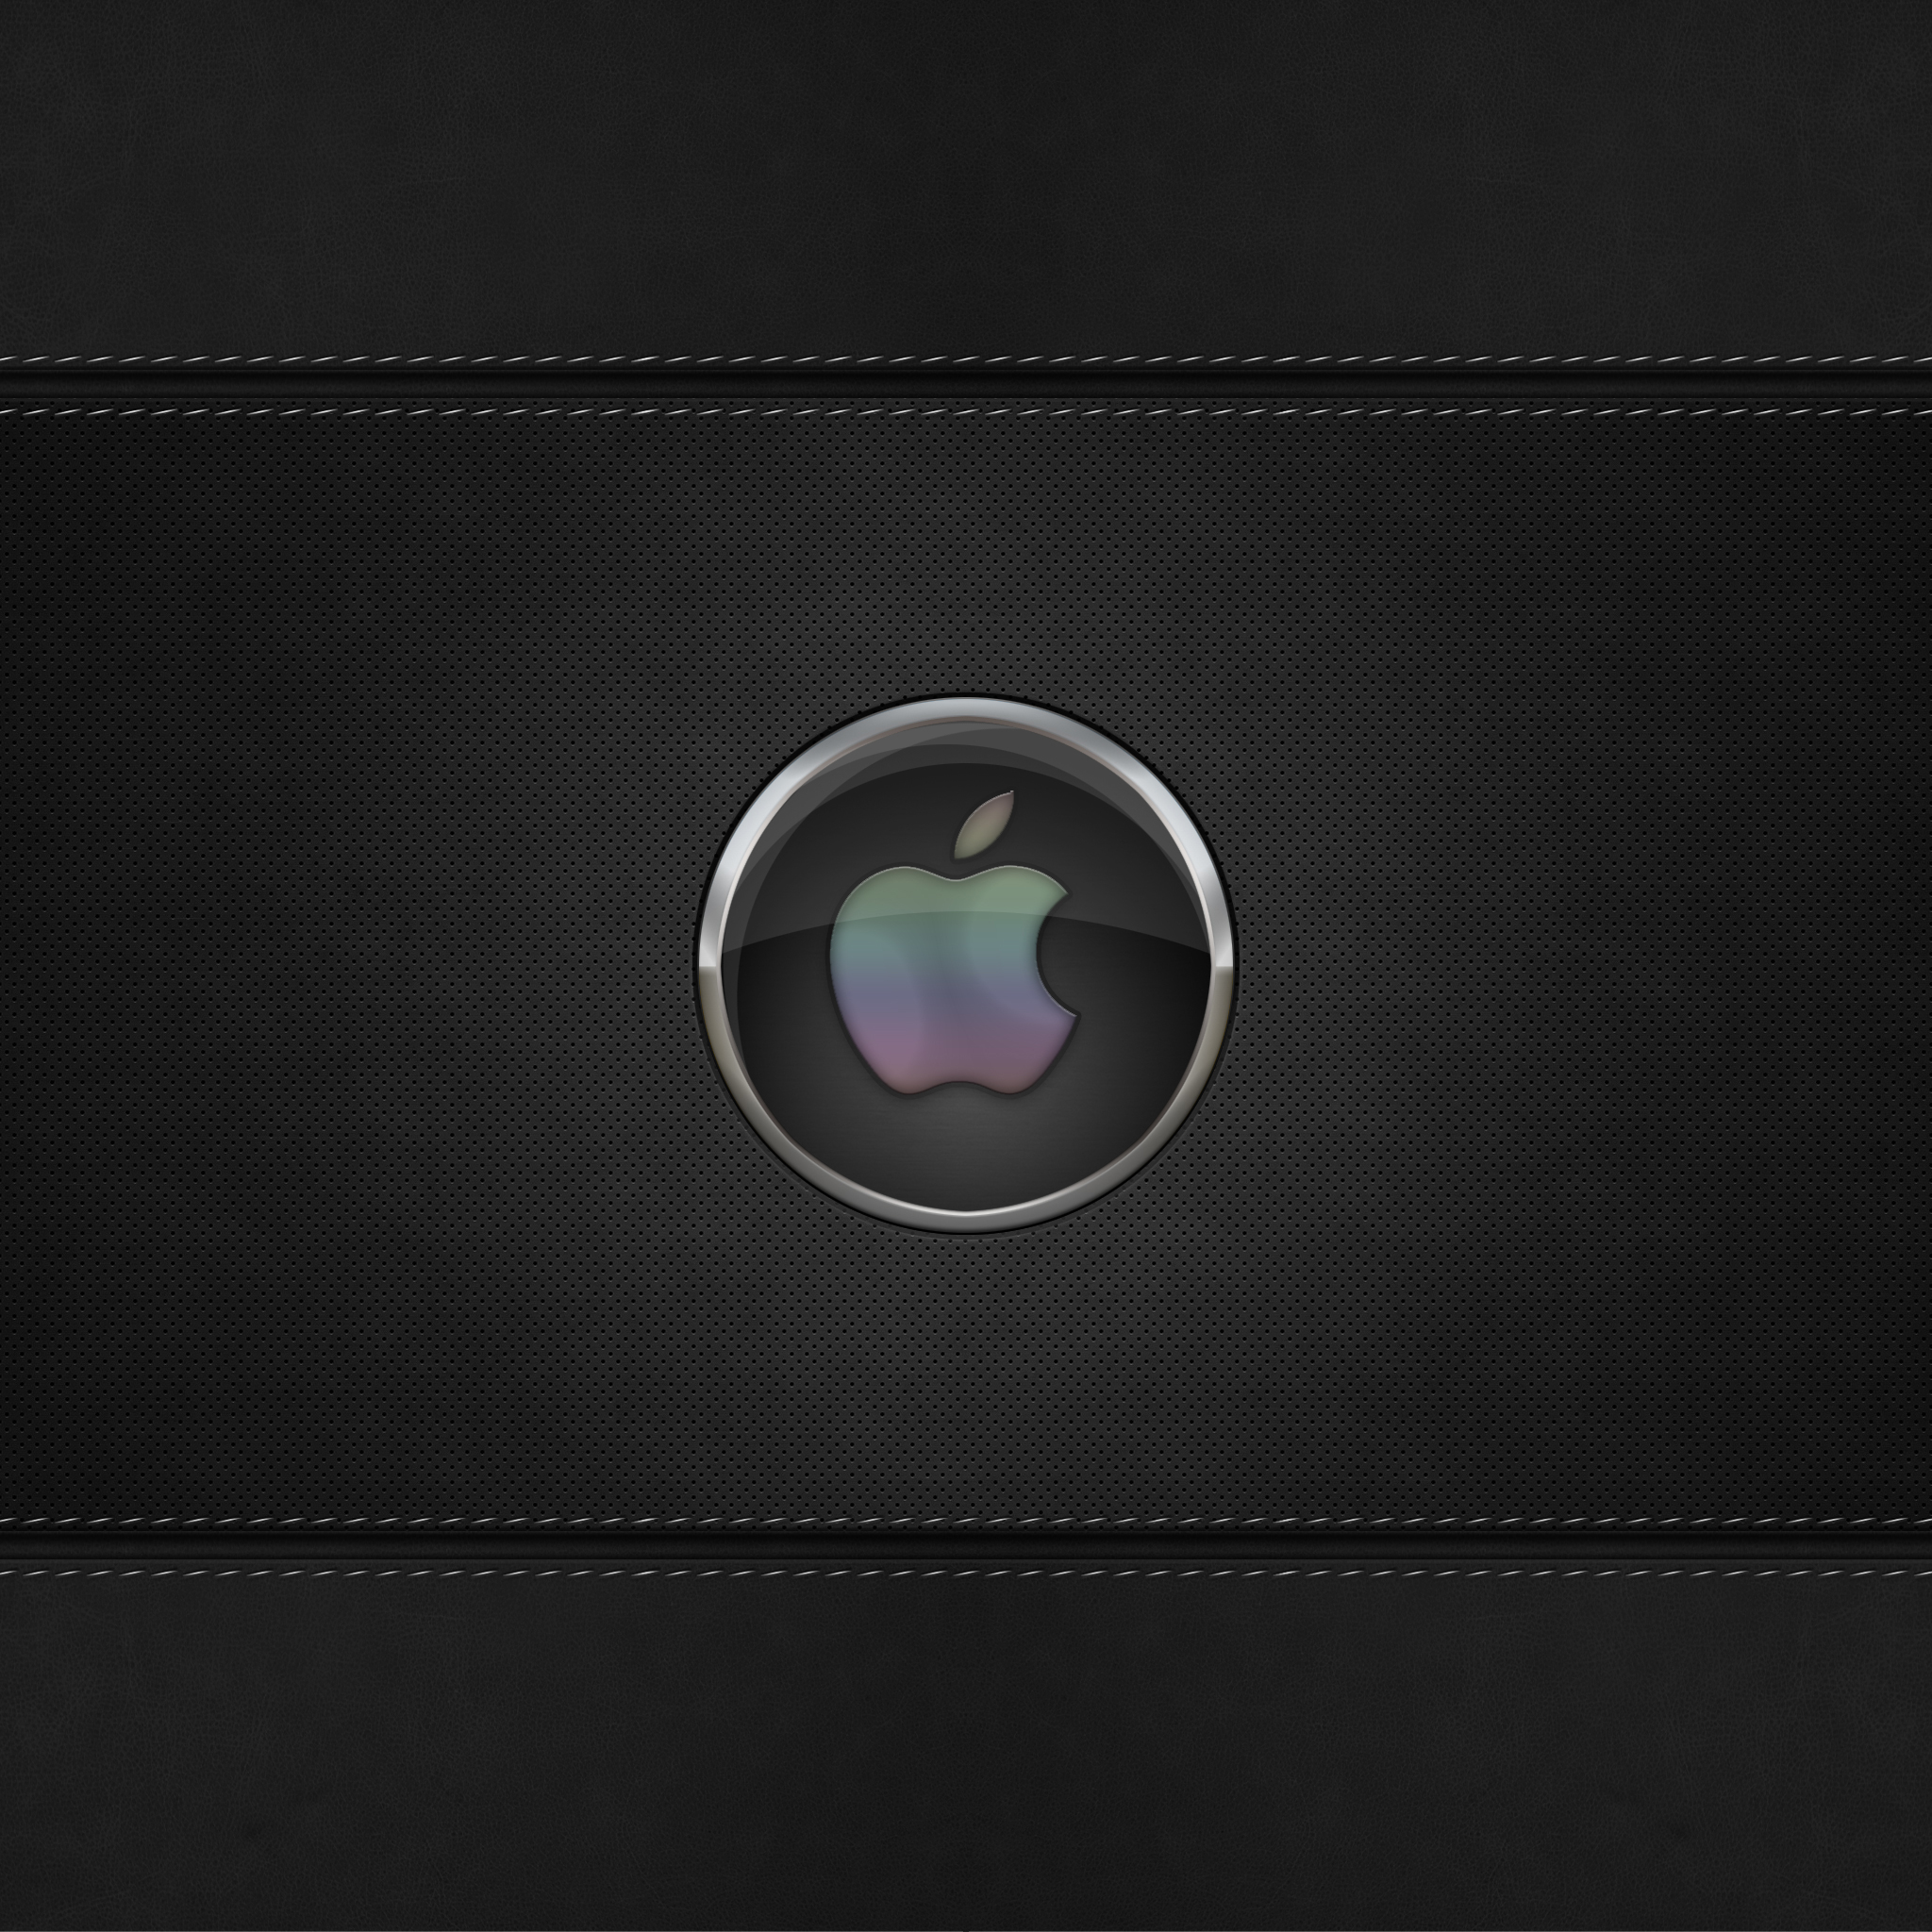 Black-Orb-3Wallpapers-iPad-Retina